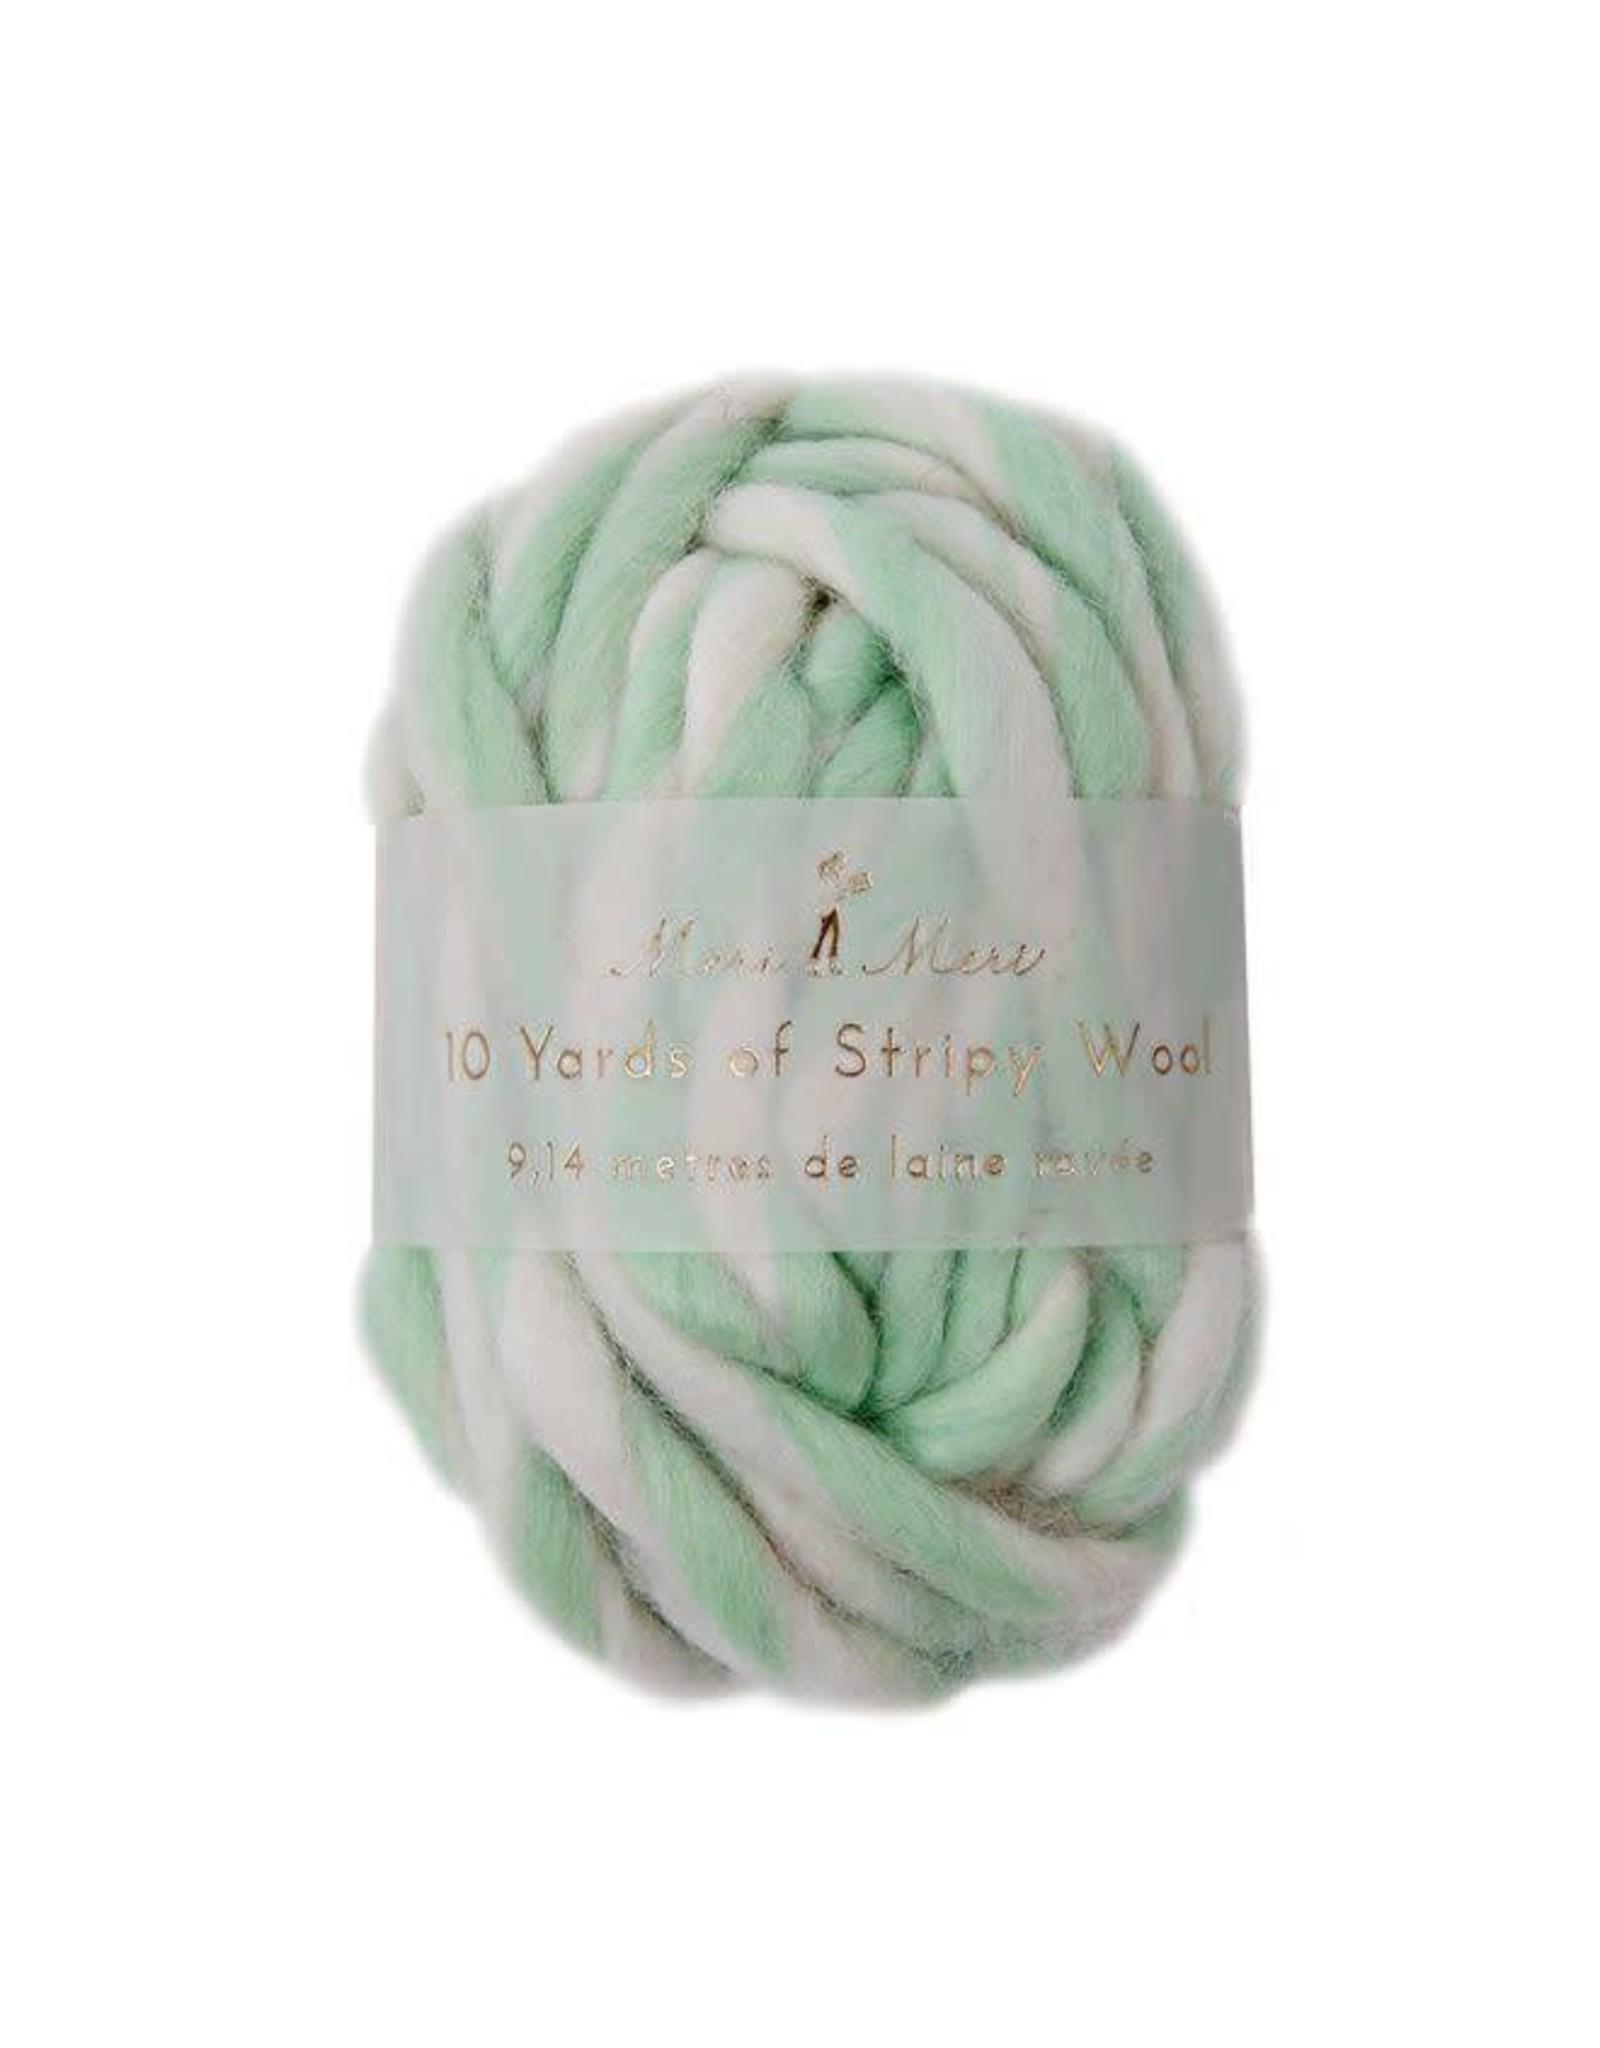 Meri Meri Stripy Wool - Mint - 9,14m